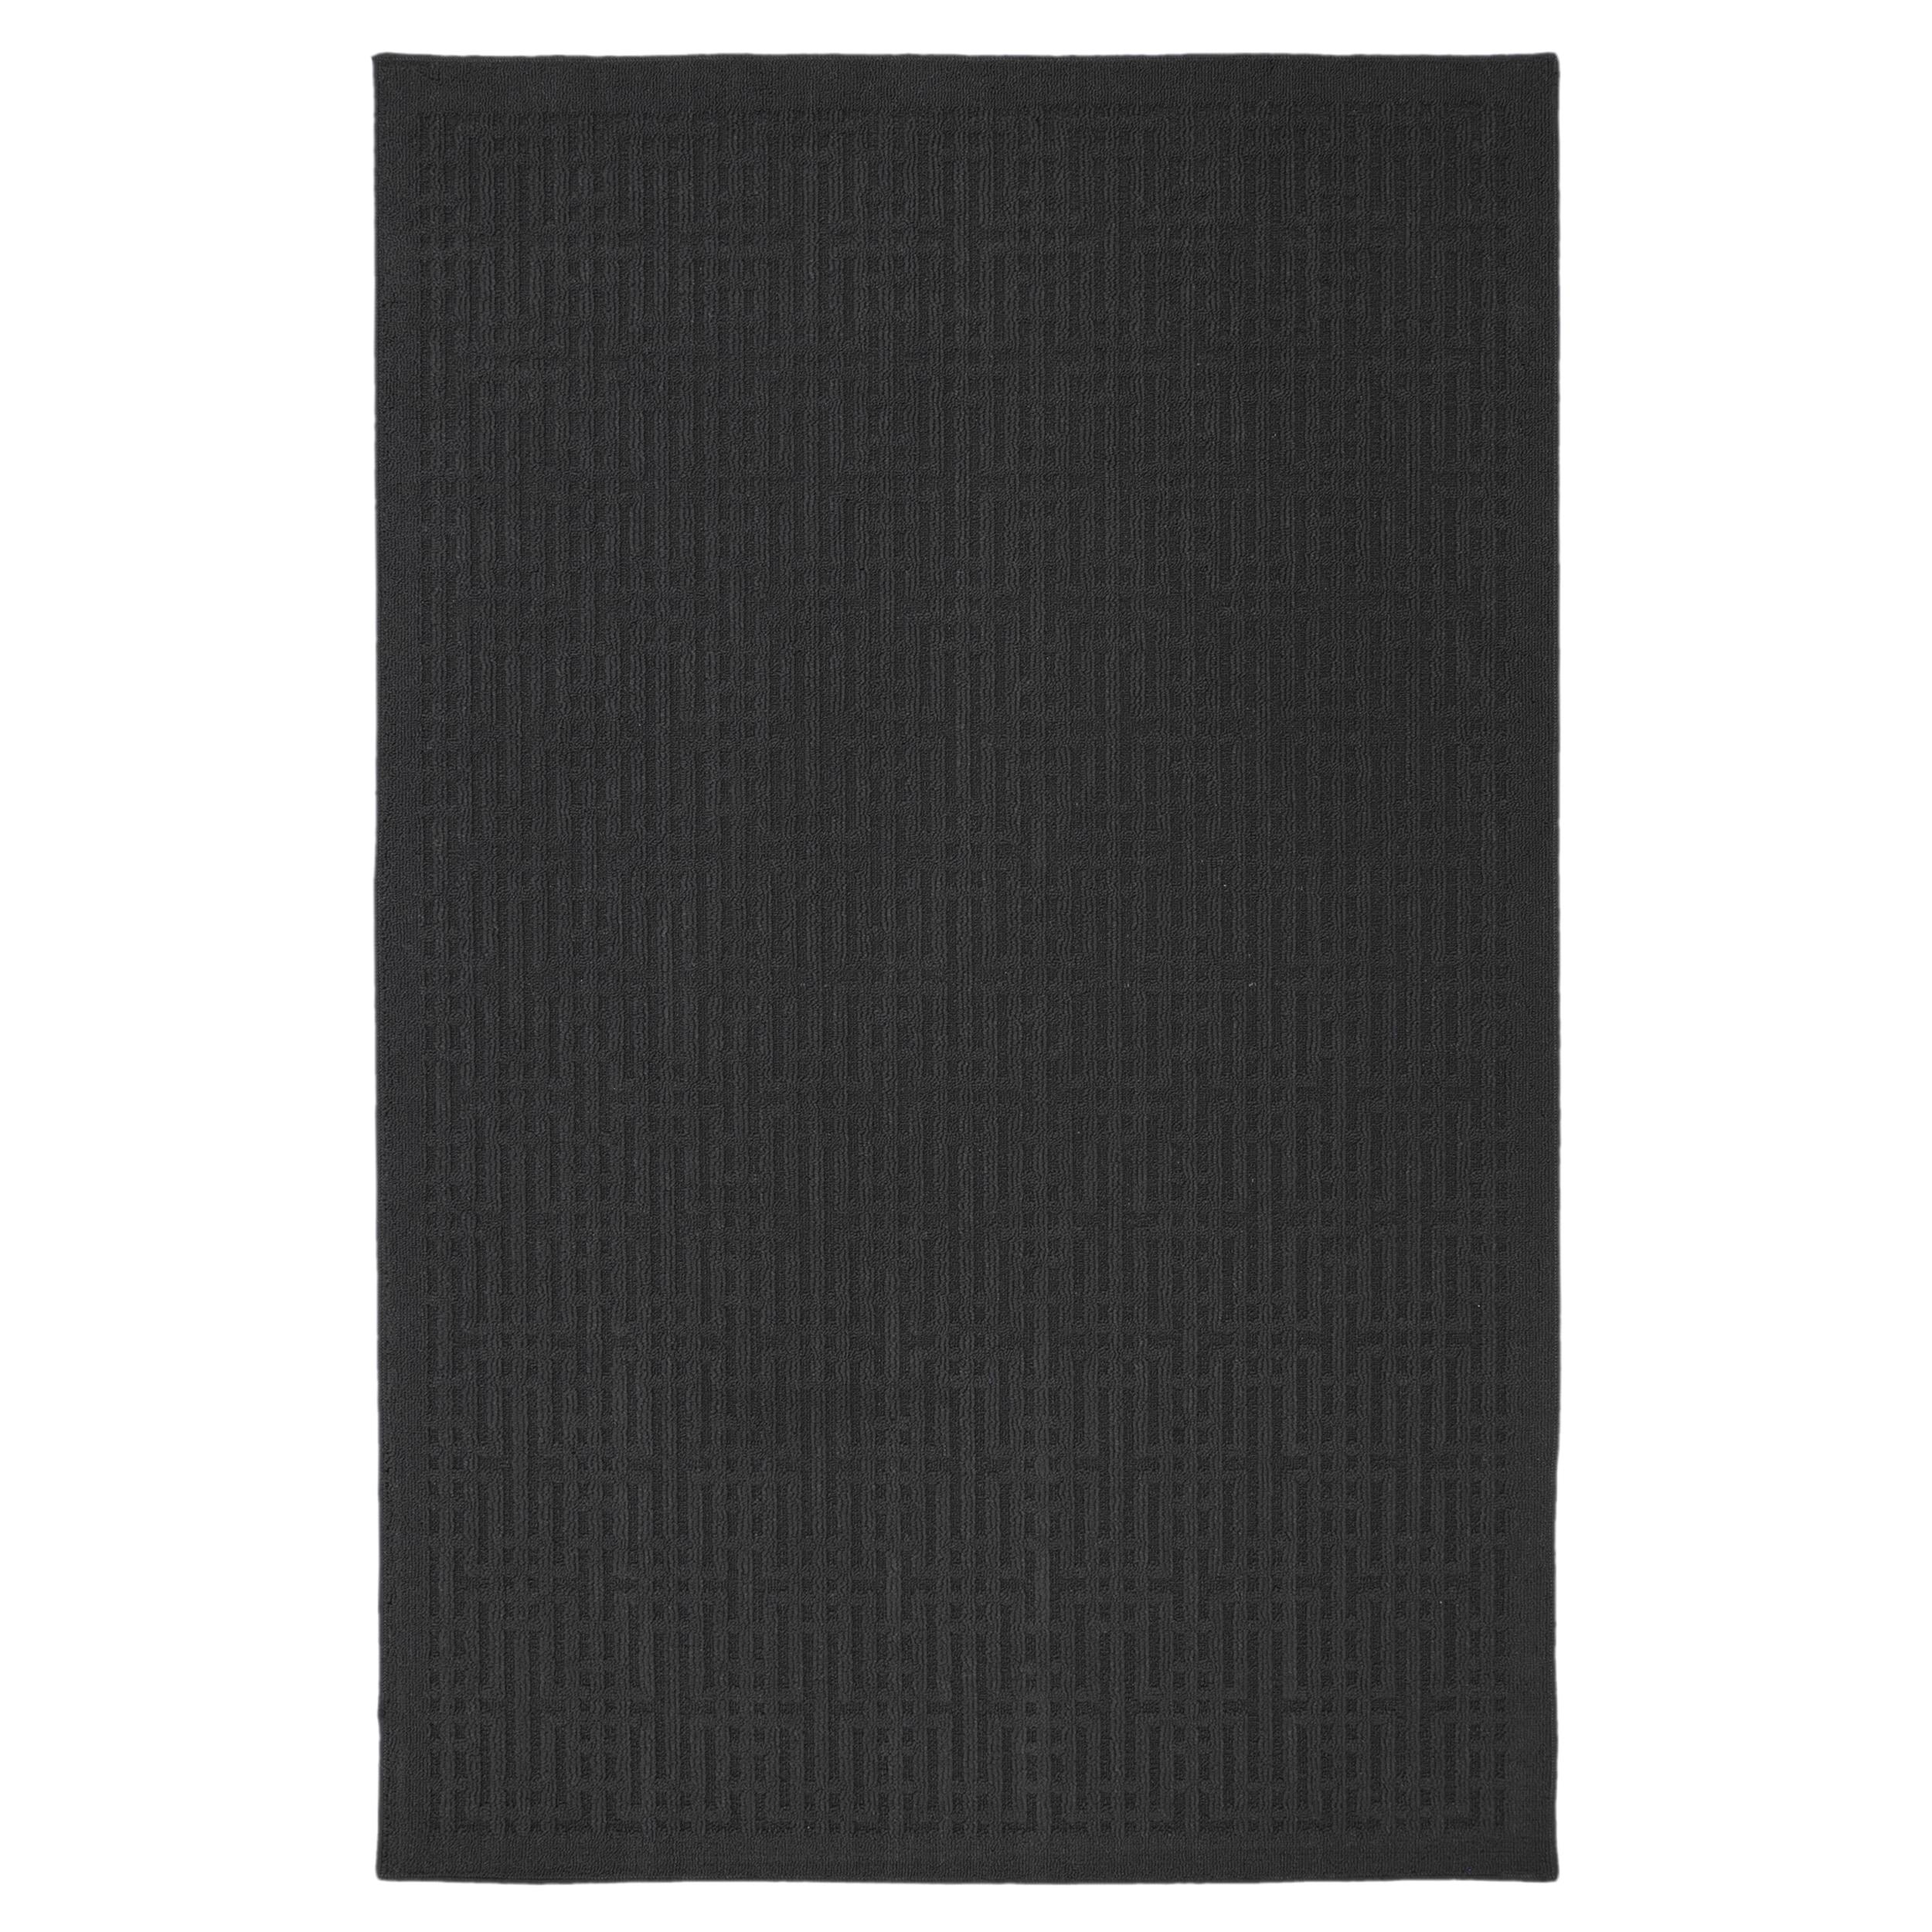 Stacks Dark Charcoal Rug (1'8 x 2'10)